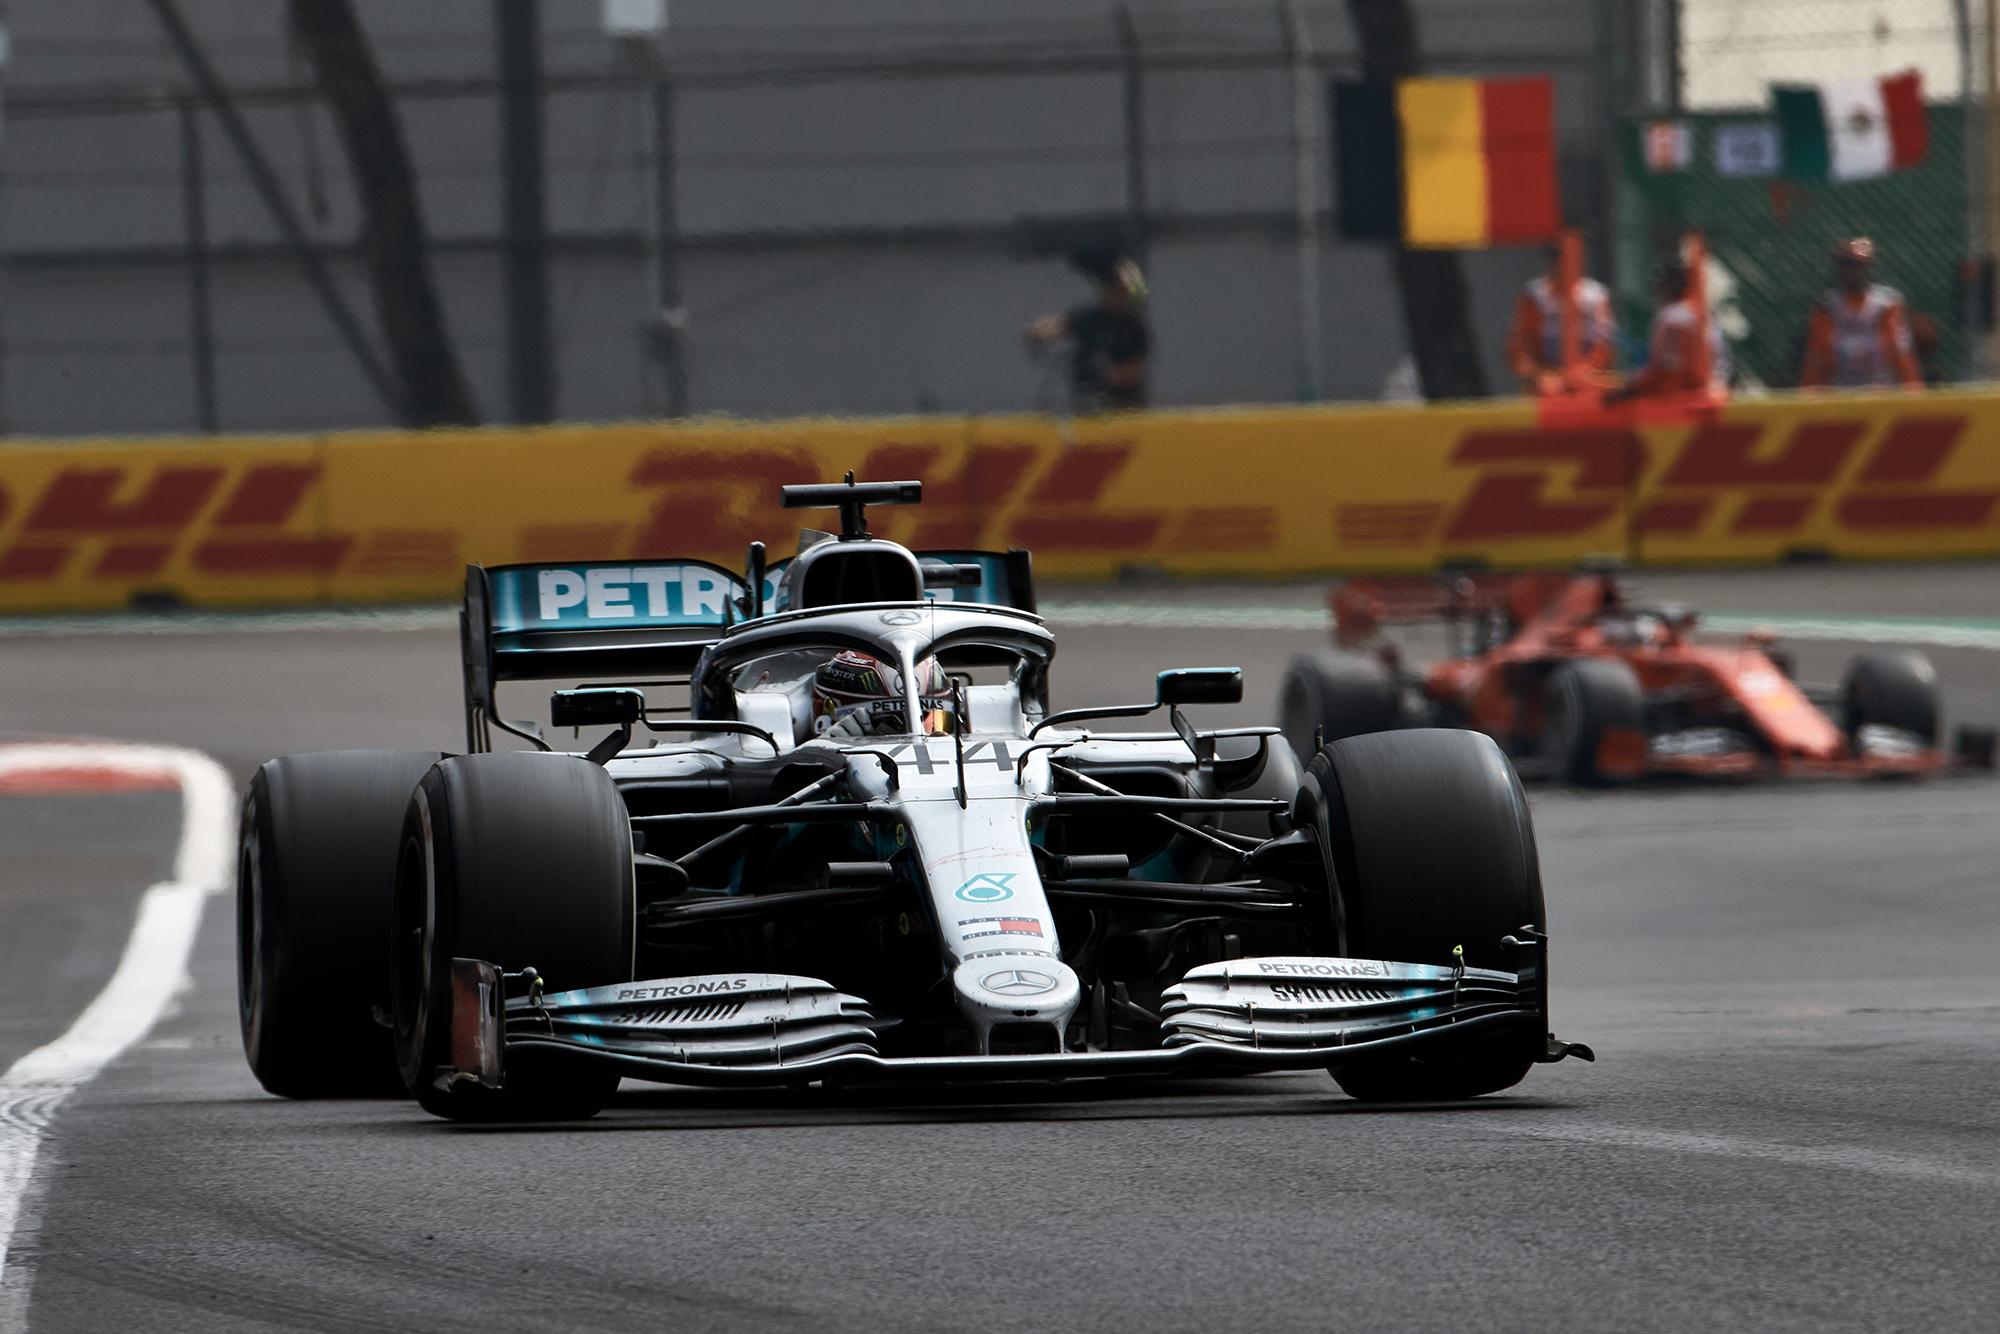 Sebastian Vettel behind Lewis Hamilton at the 2019 F1 Mexican Grand Prix